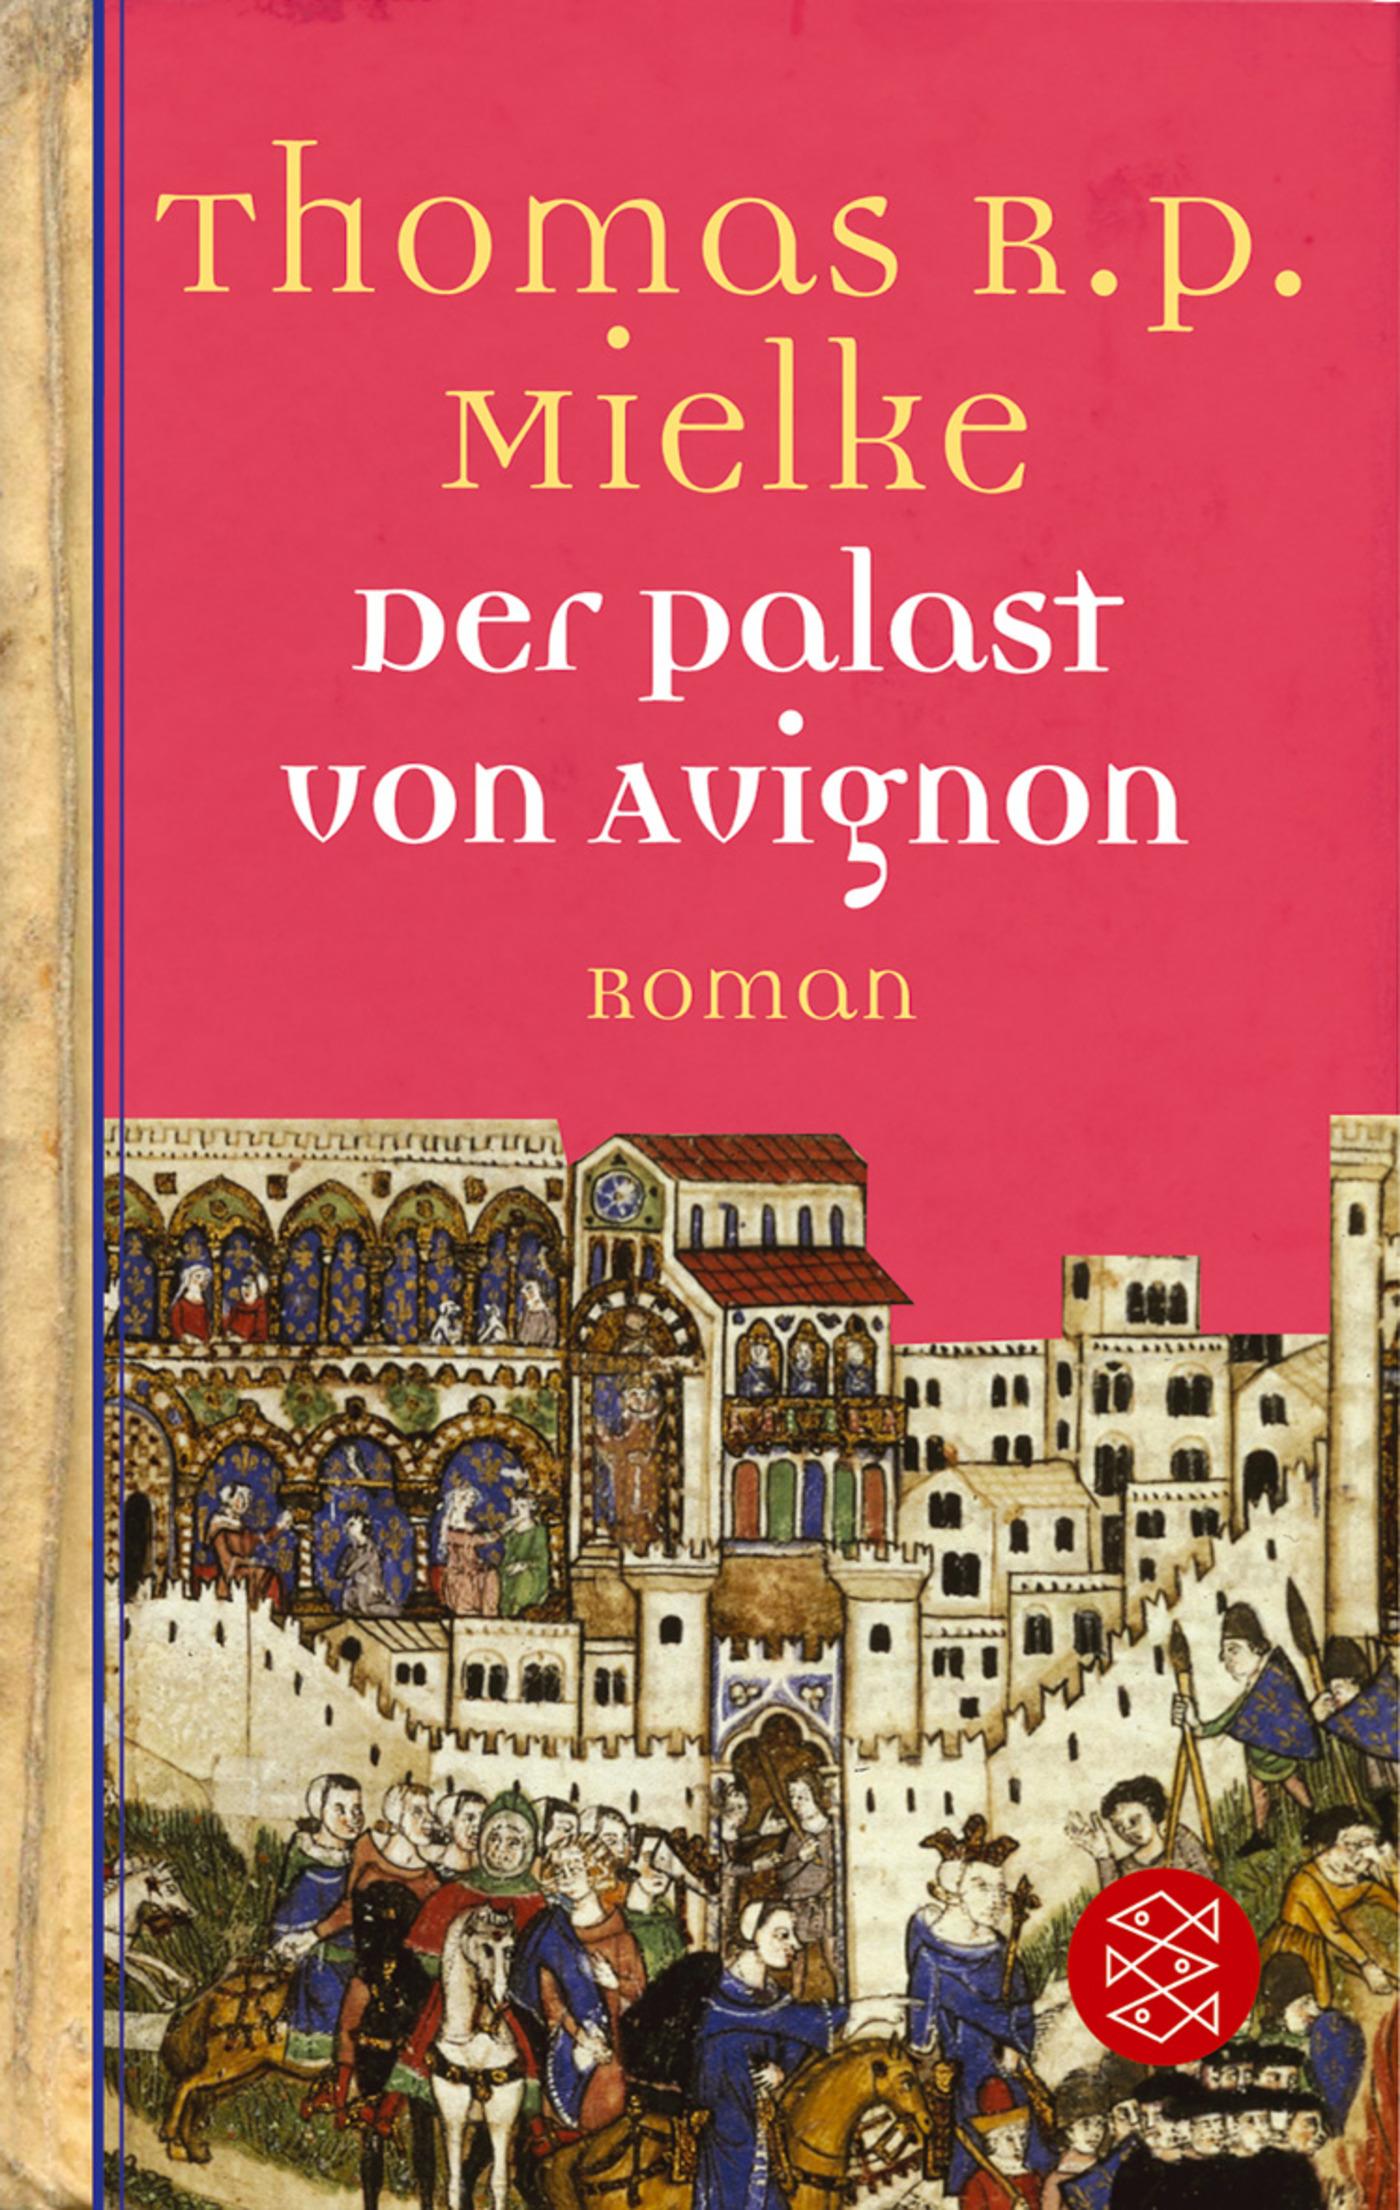 Der-Palast-von-Avignon-Thomas-R-P-Mielke